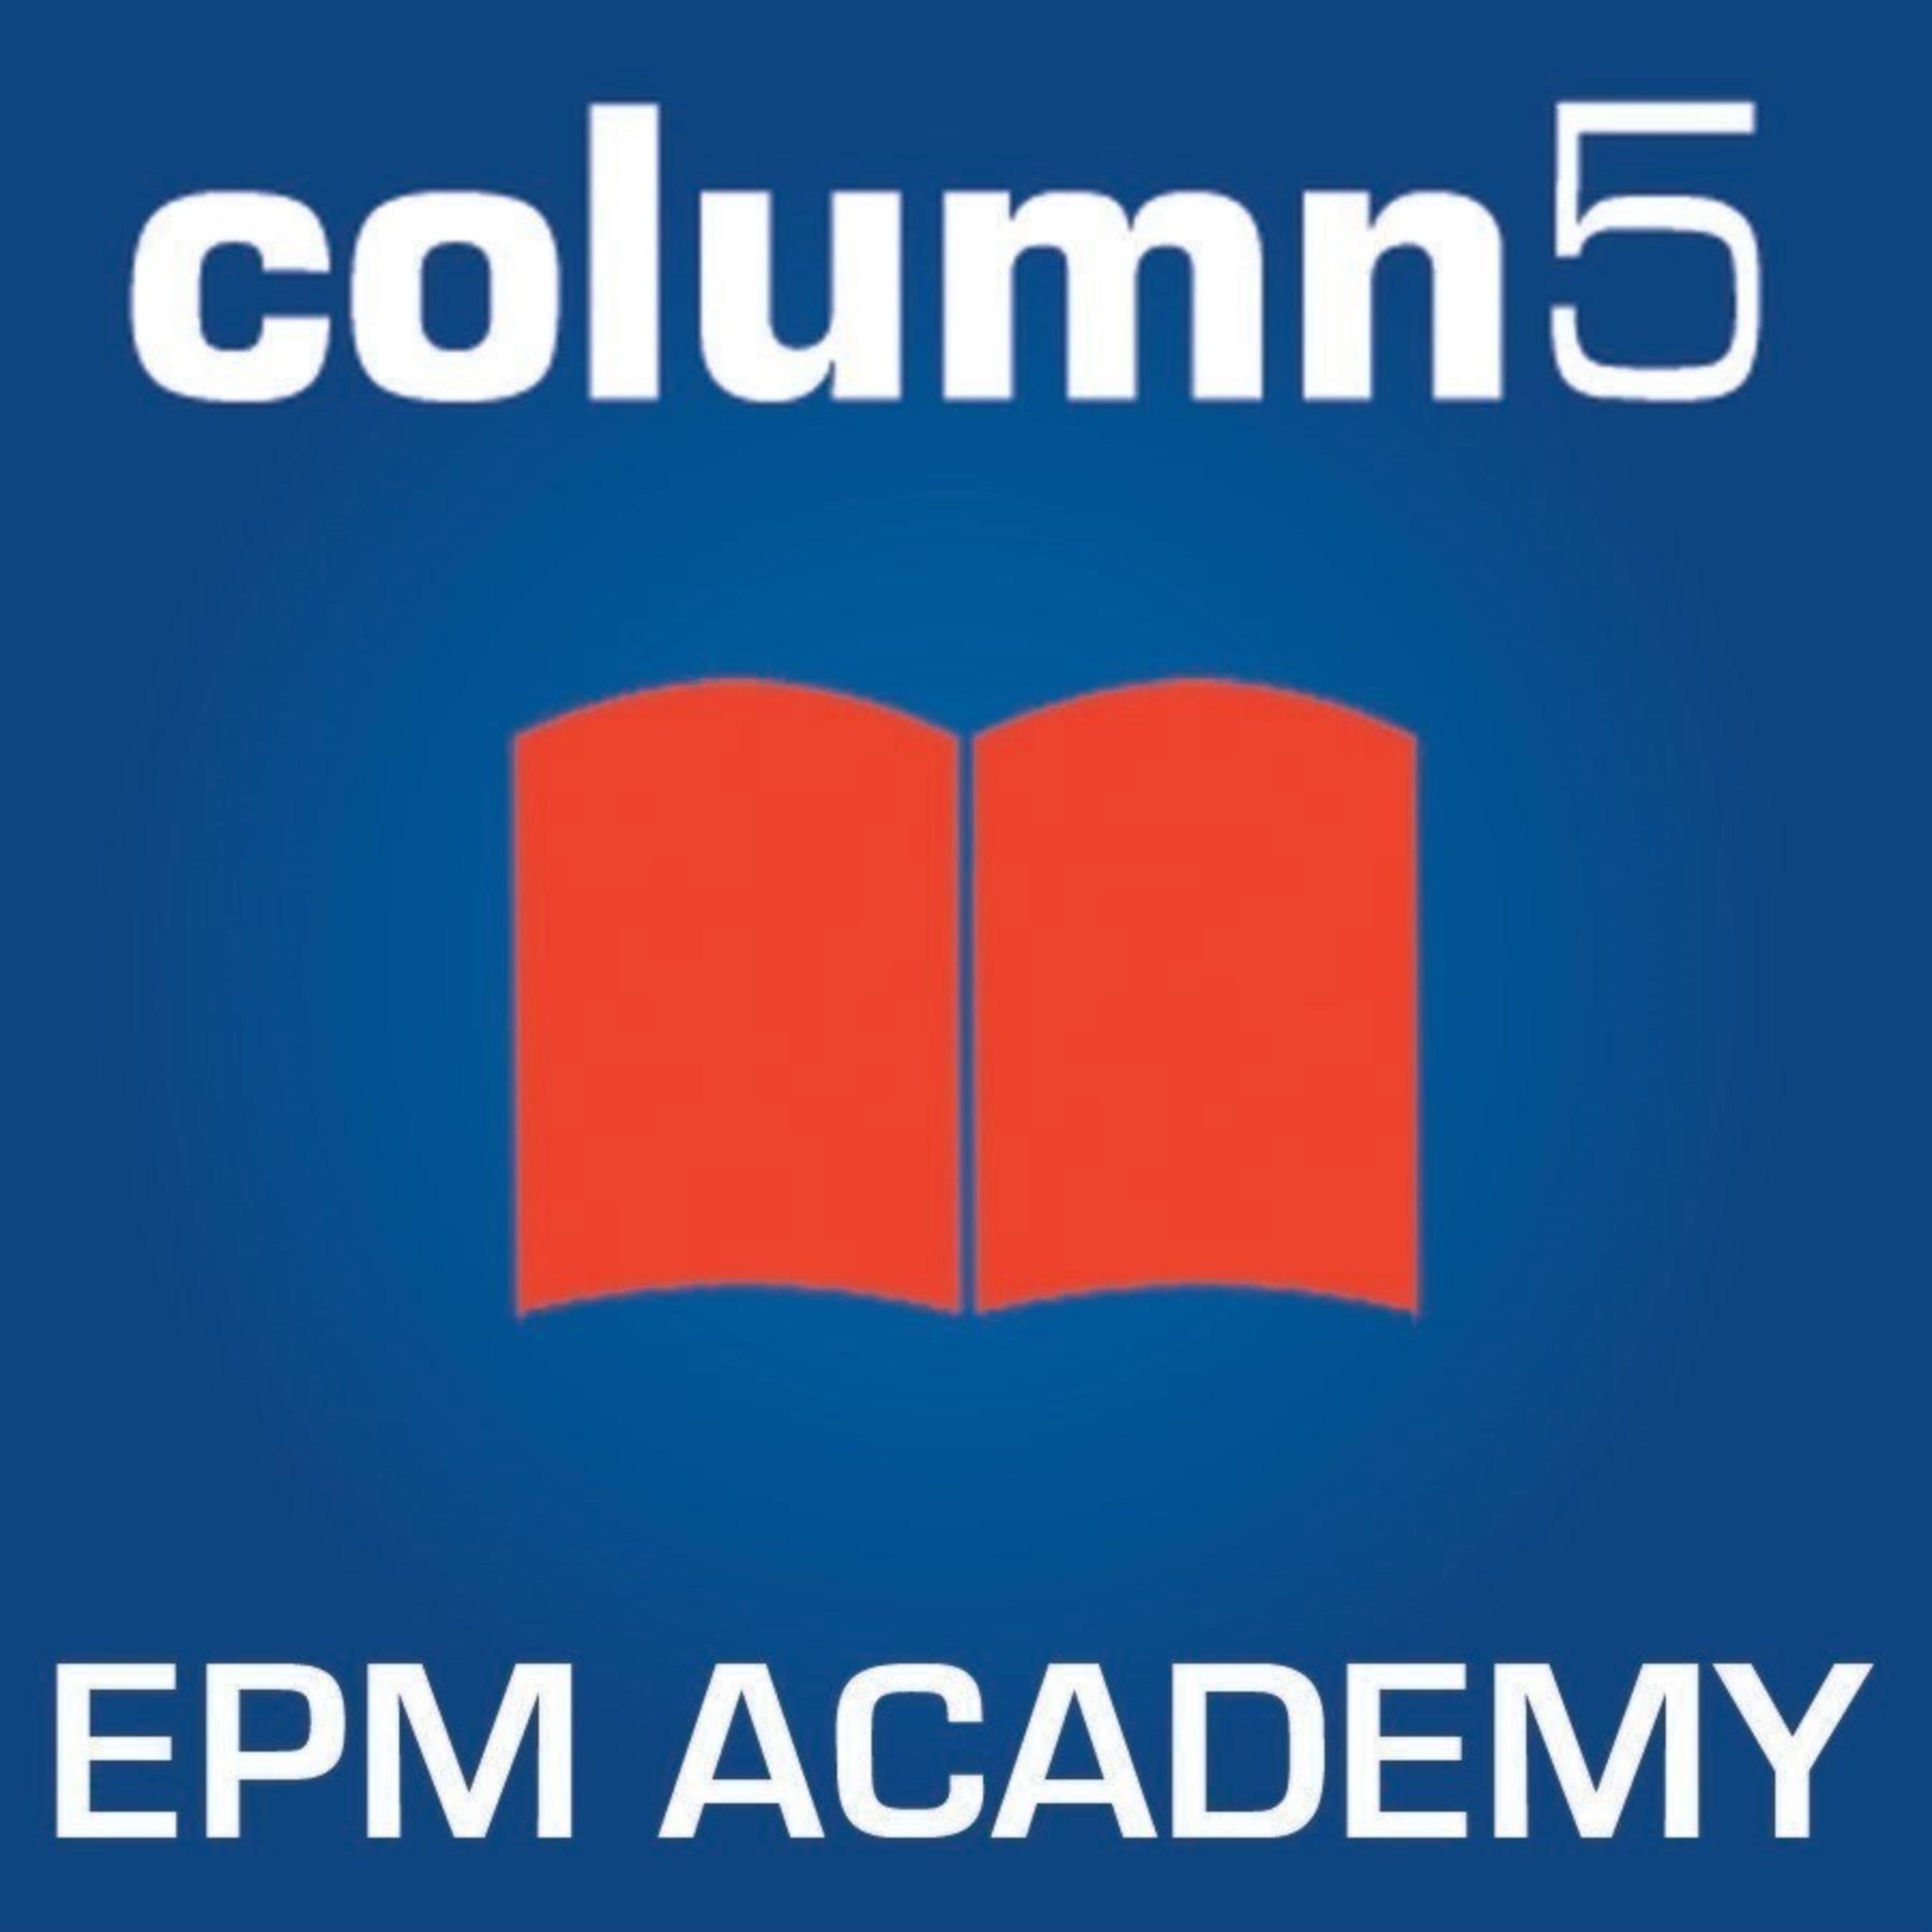 Column5 Consulting EPM Academy Wins Platinum MarCom Award